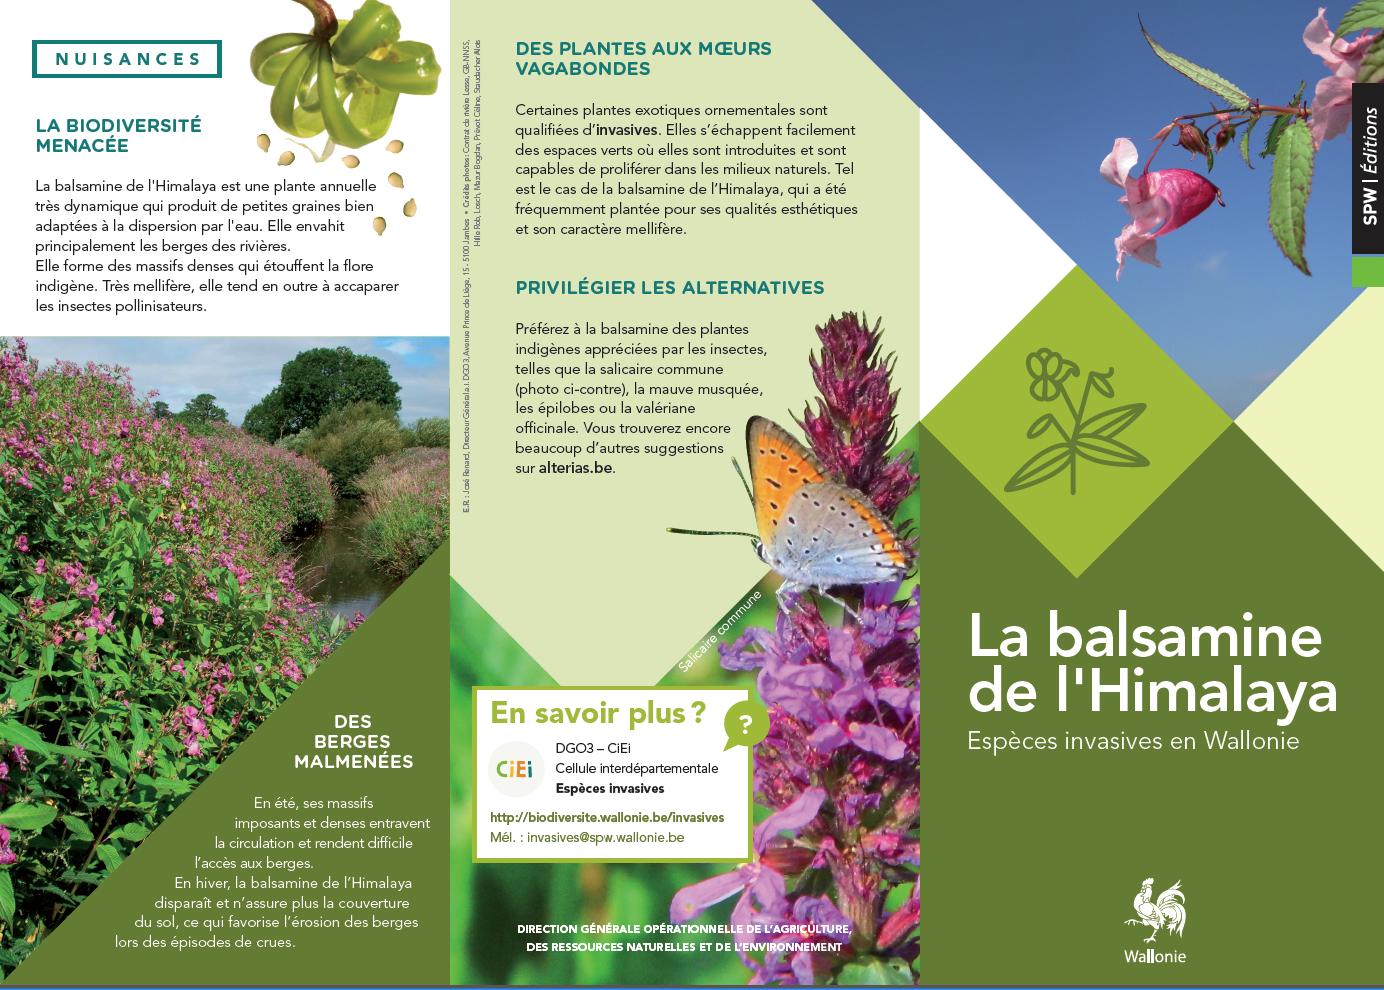 La balsamine de l'Himalaya : Espèces invasives en Wallonie